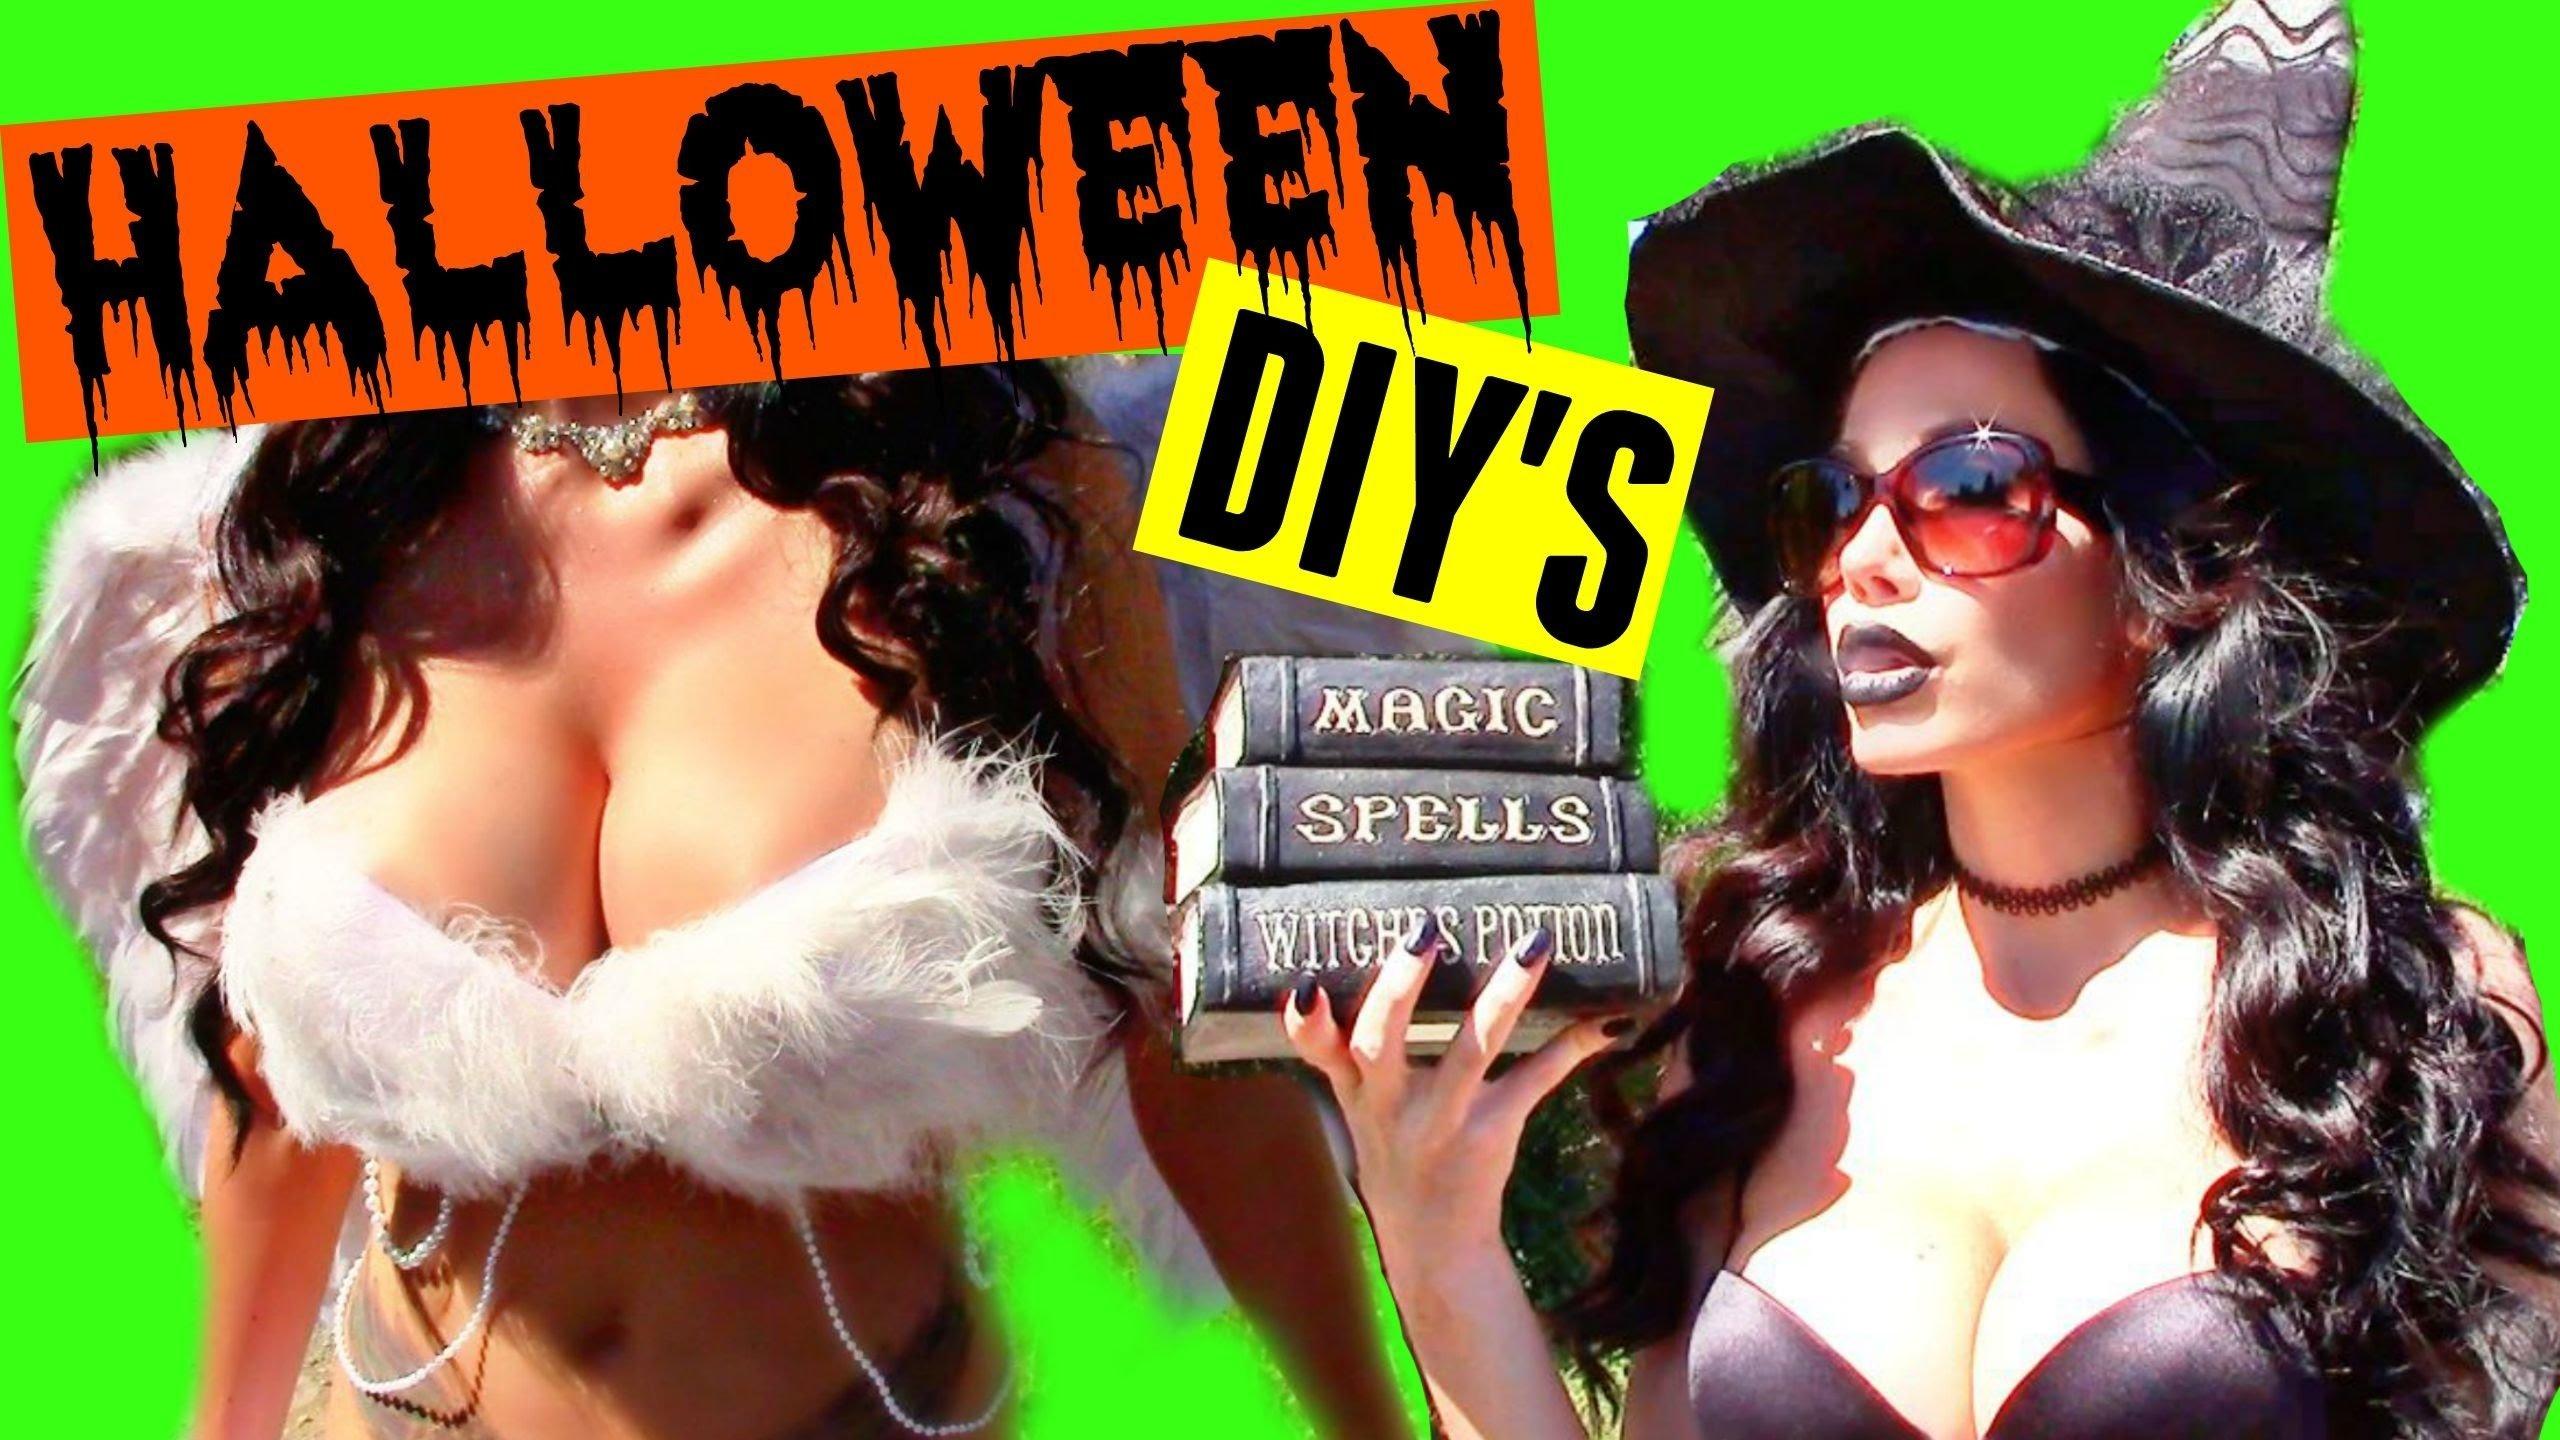 10 Cute Sexy Easy Halloween Costume Ideas sexy halloween costume ideas diy upbra youtube 1 2020